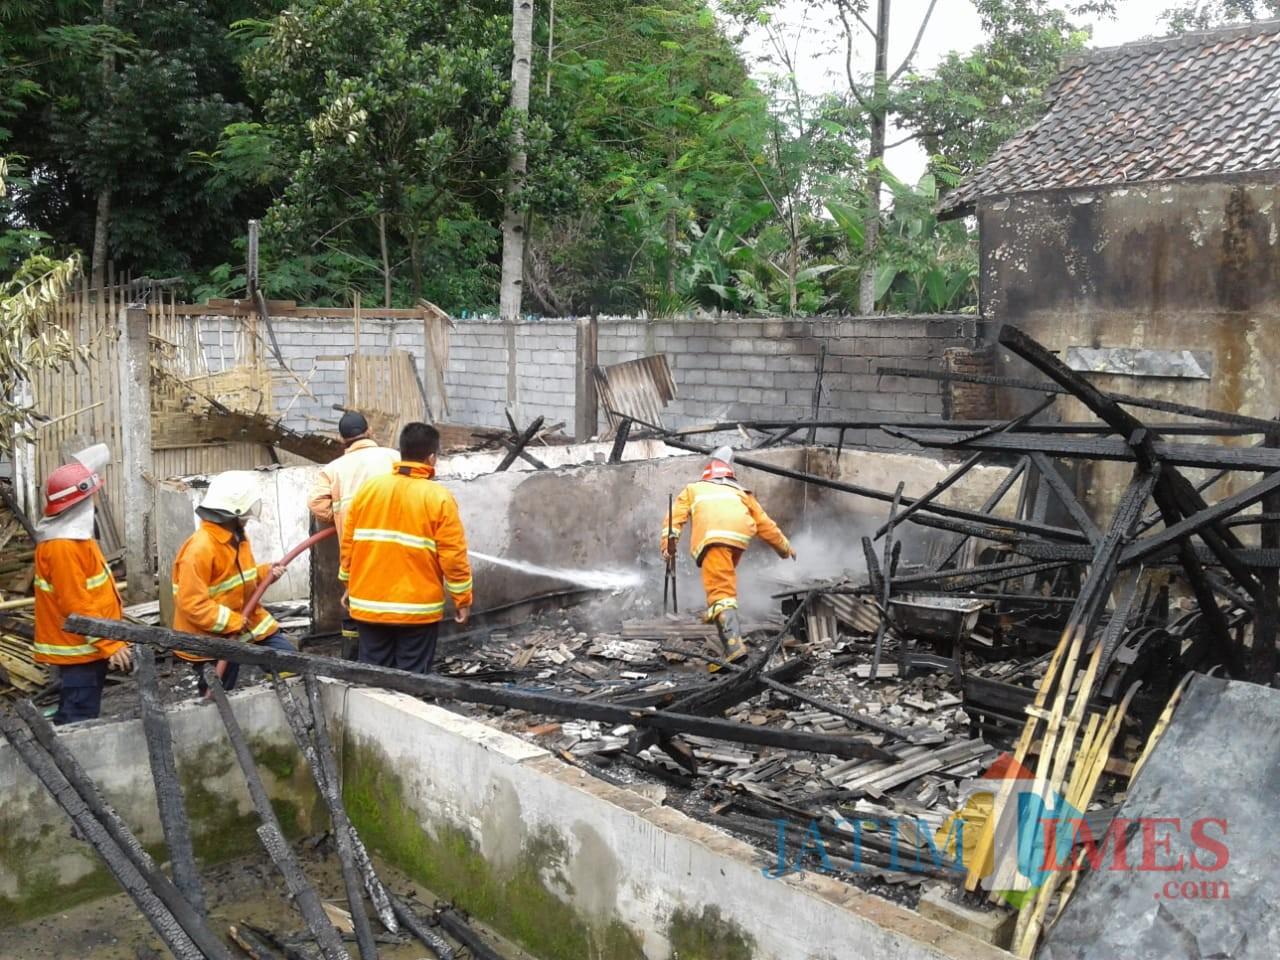 Petugas pemadam kebakaran saat berupaya memadamkan api, Kecamatan Turen (Foto : PPBK Kabupaten Malang for MalangTIMES)